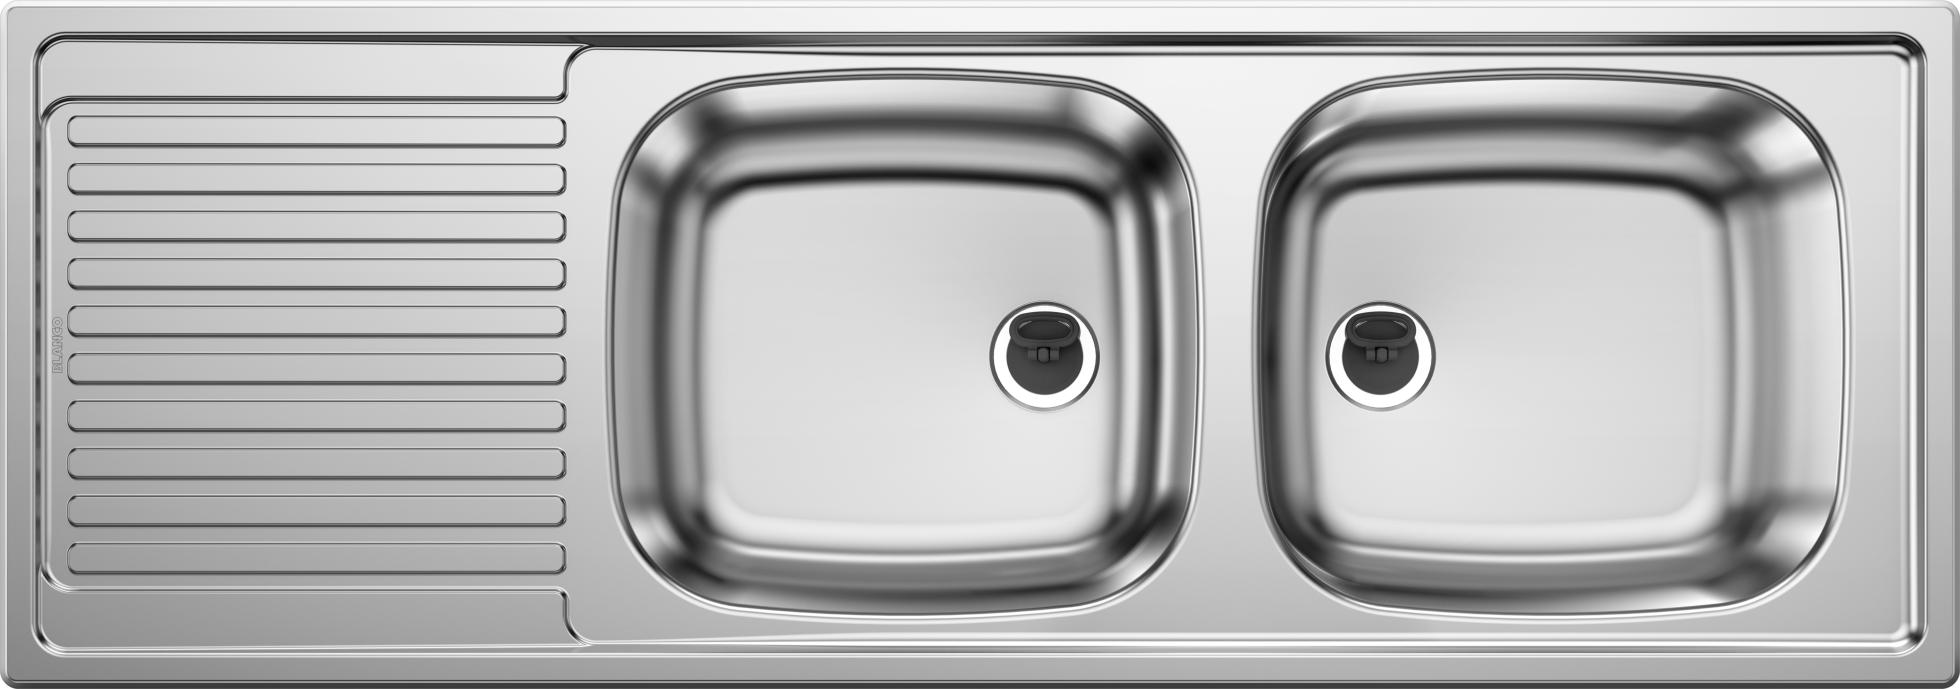 Blanco Top EZS 11 x 4 Edelstahlspüle Naturfinish Set